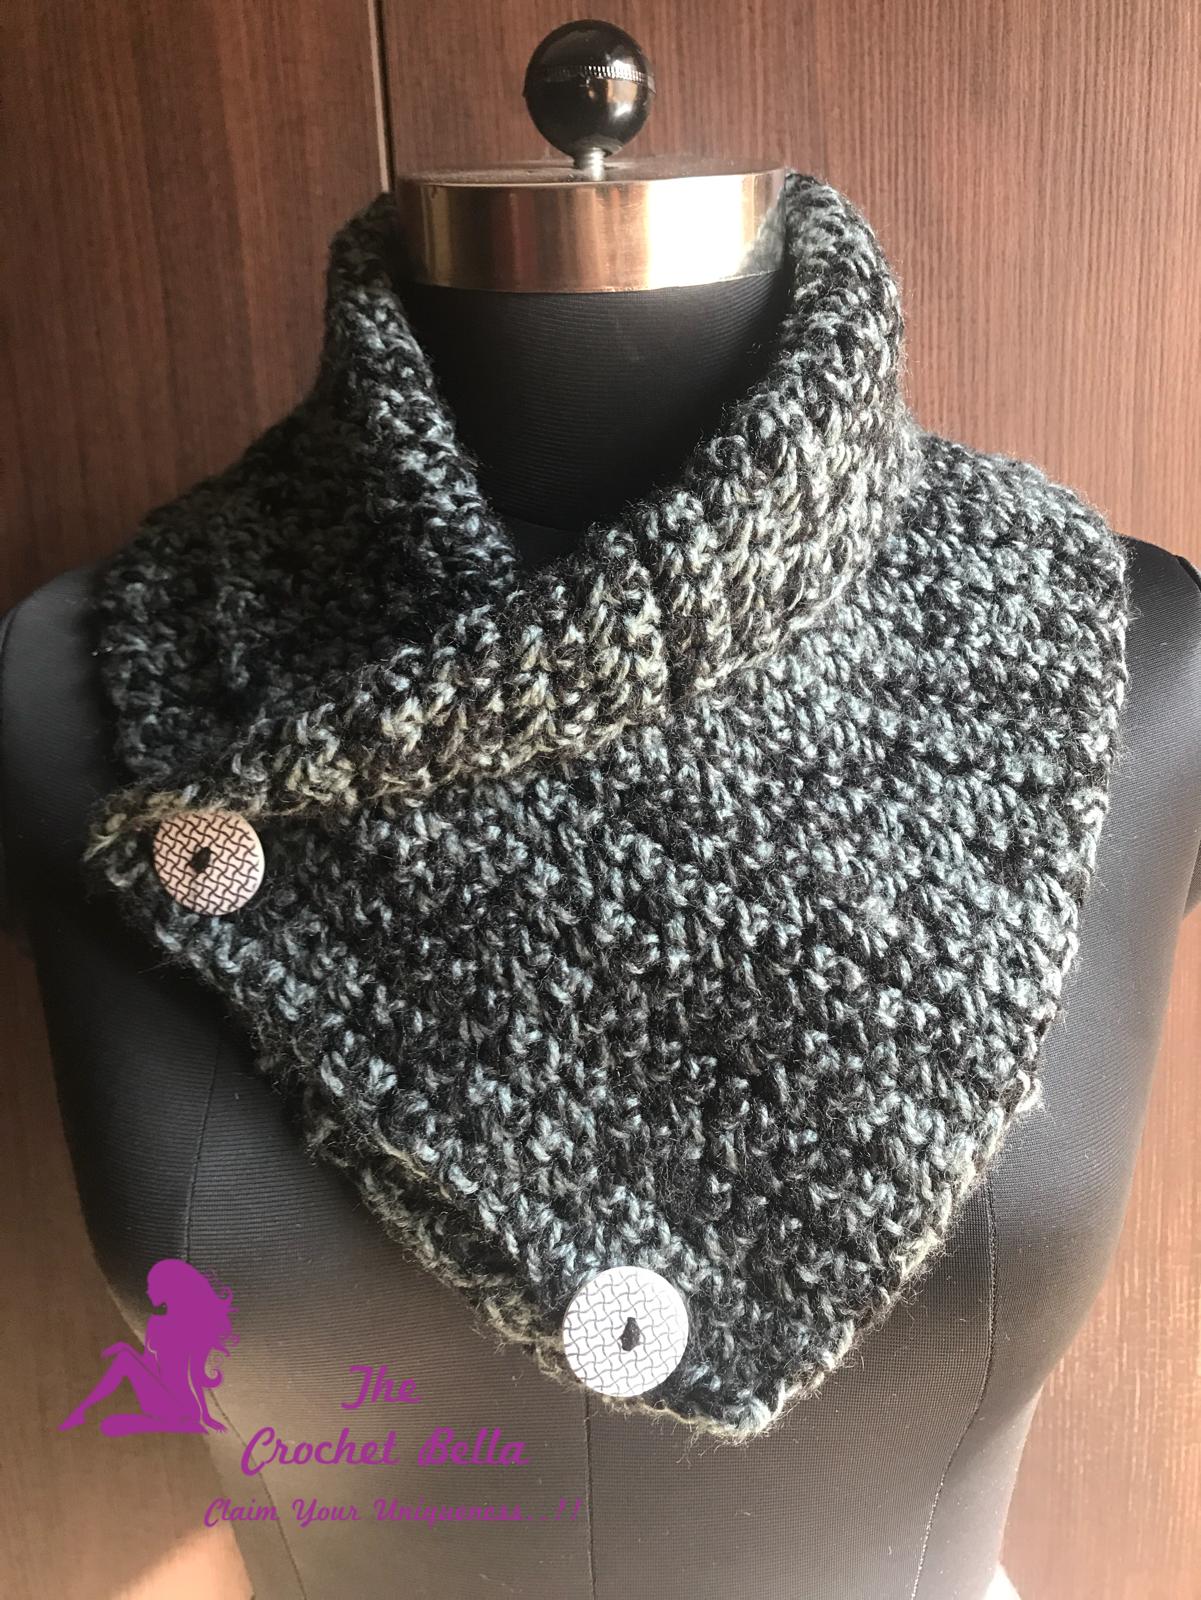 Crochet Woolen Cowl/Neck warmer - The Crochet Bella